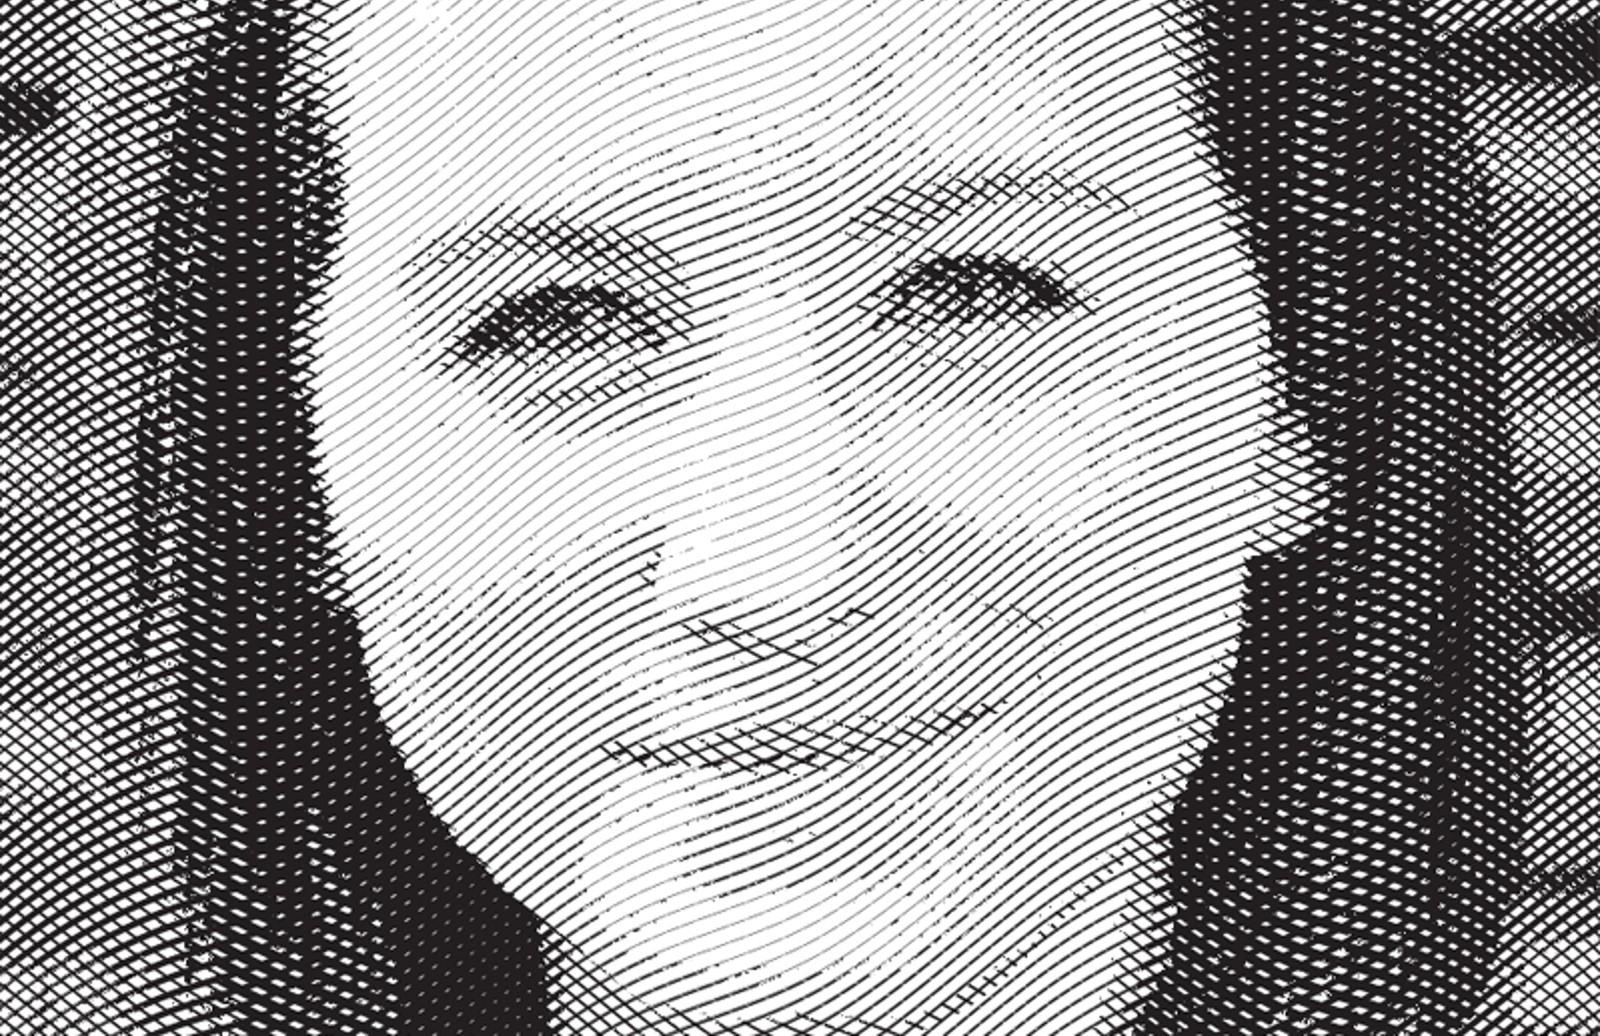 Photoshop Photo Line Art Effect : Engraving photoshop action — medialoot